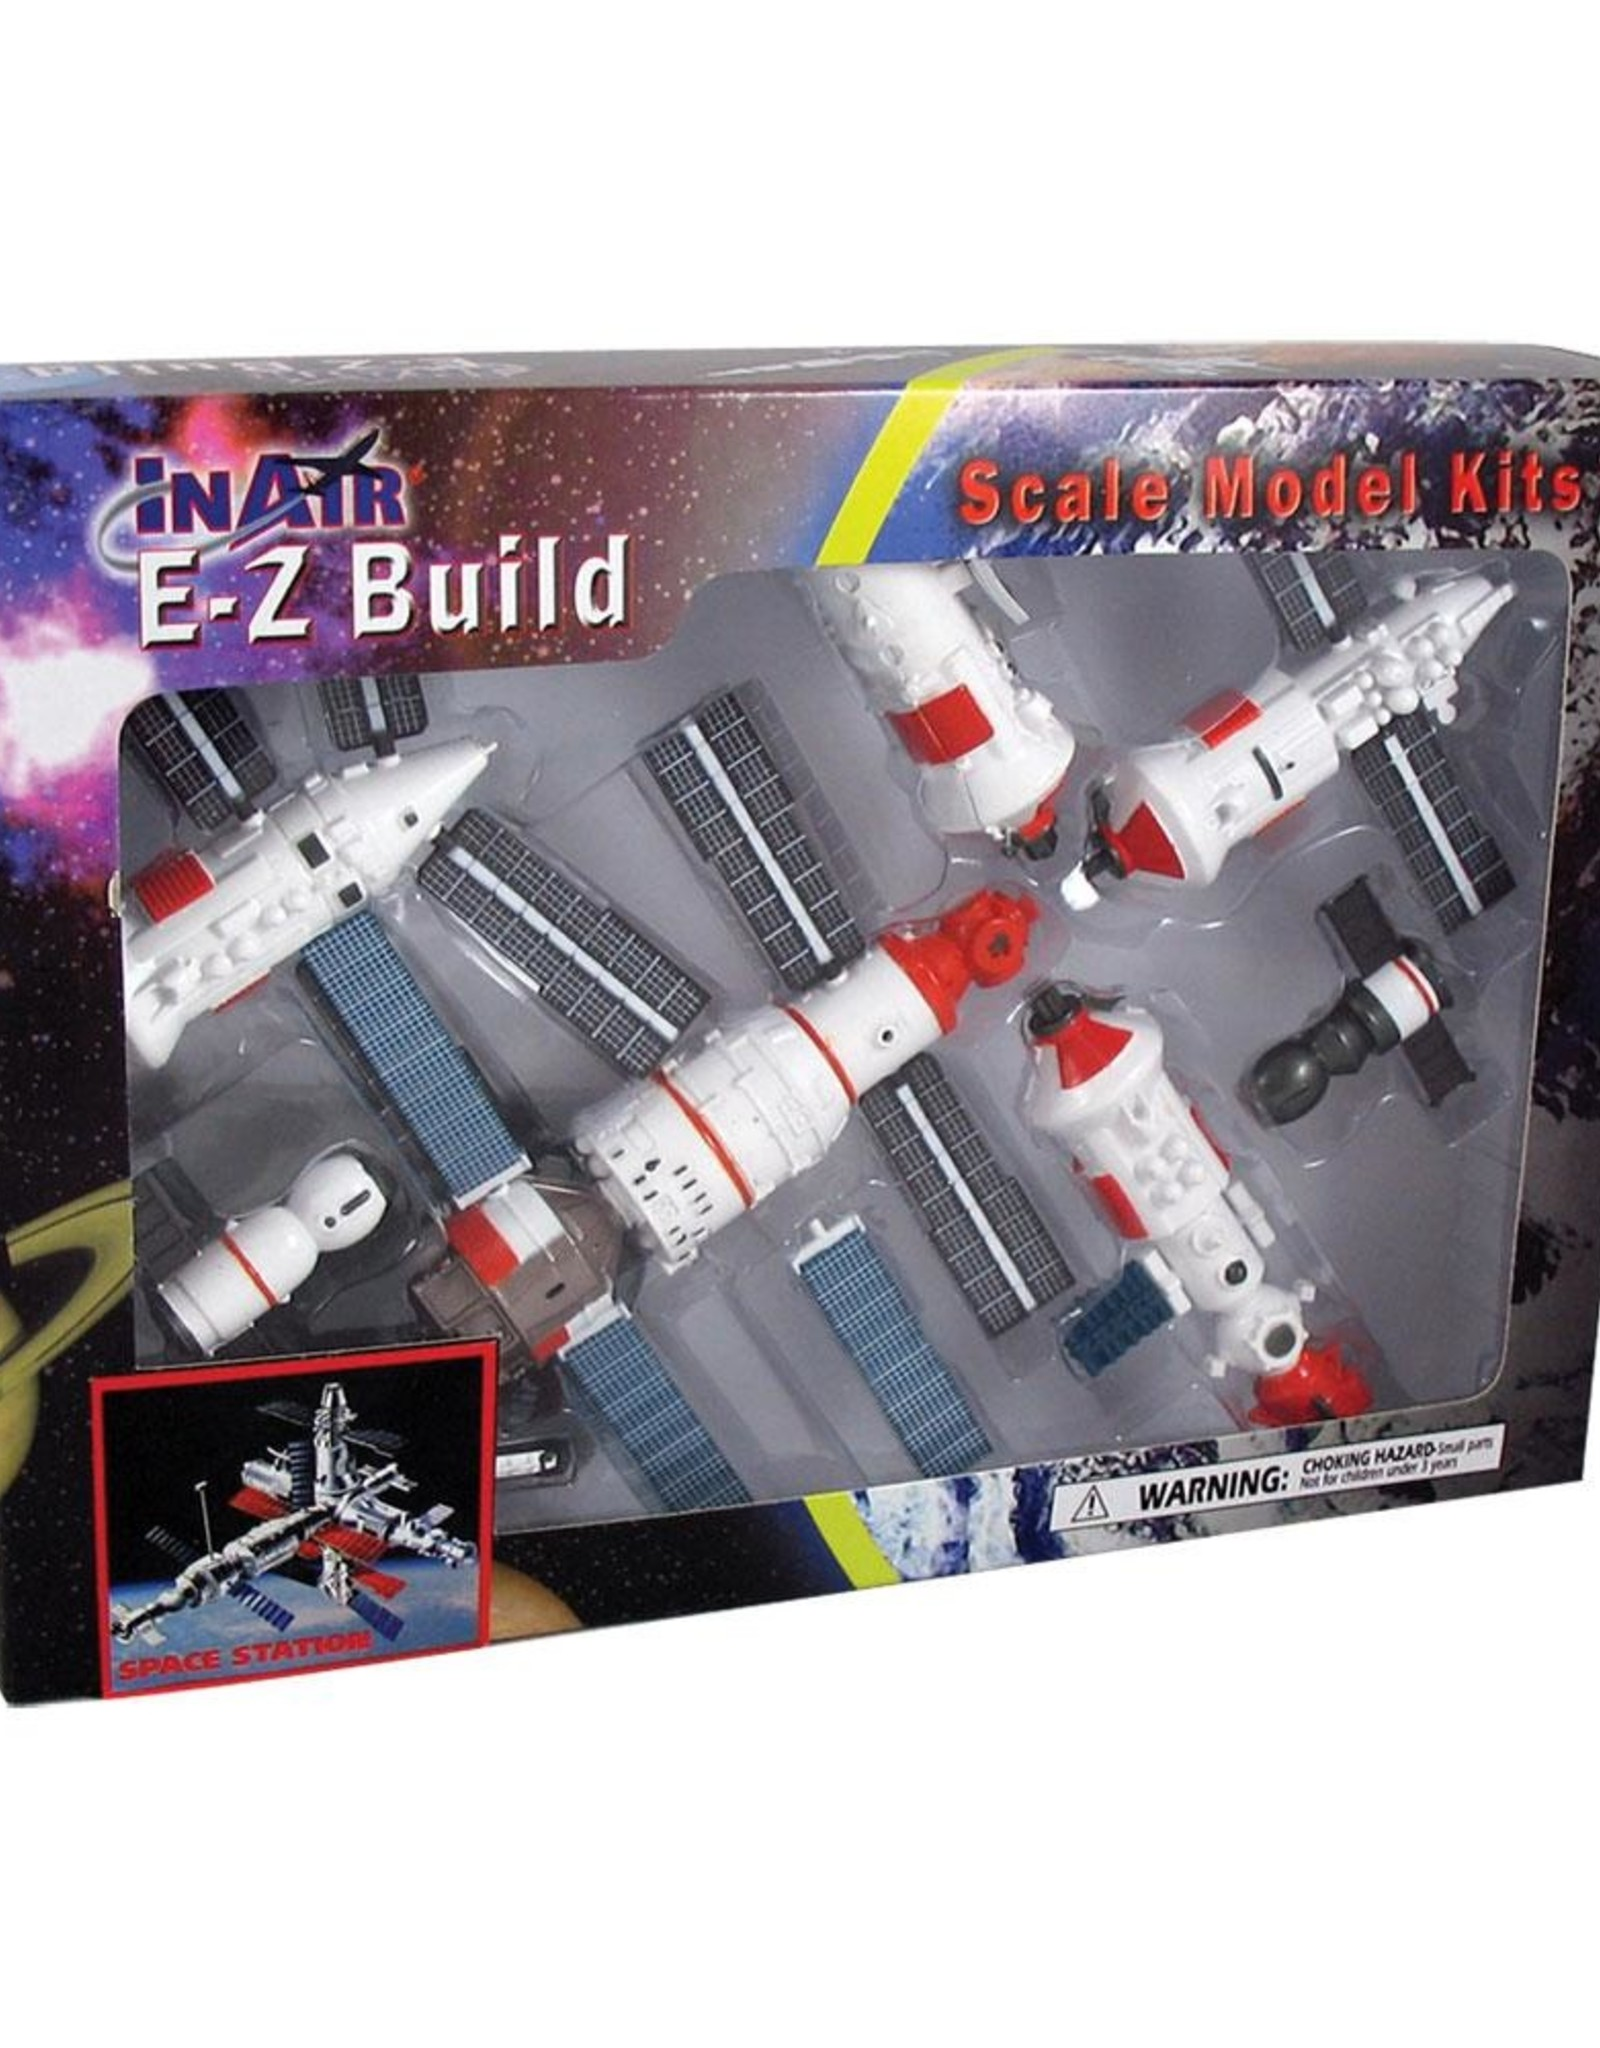 E-Z Build Space Station Model Kit